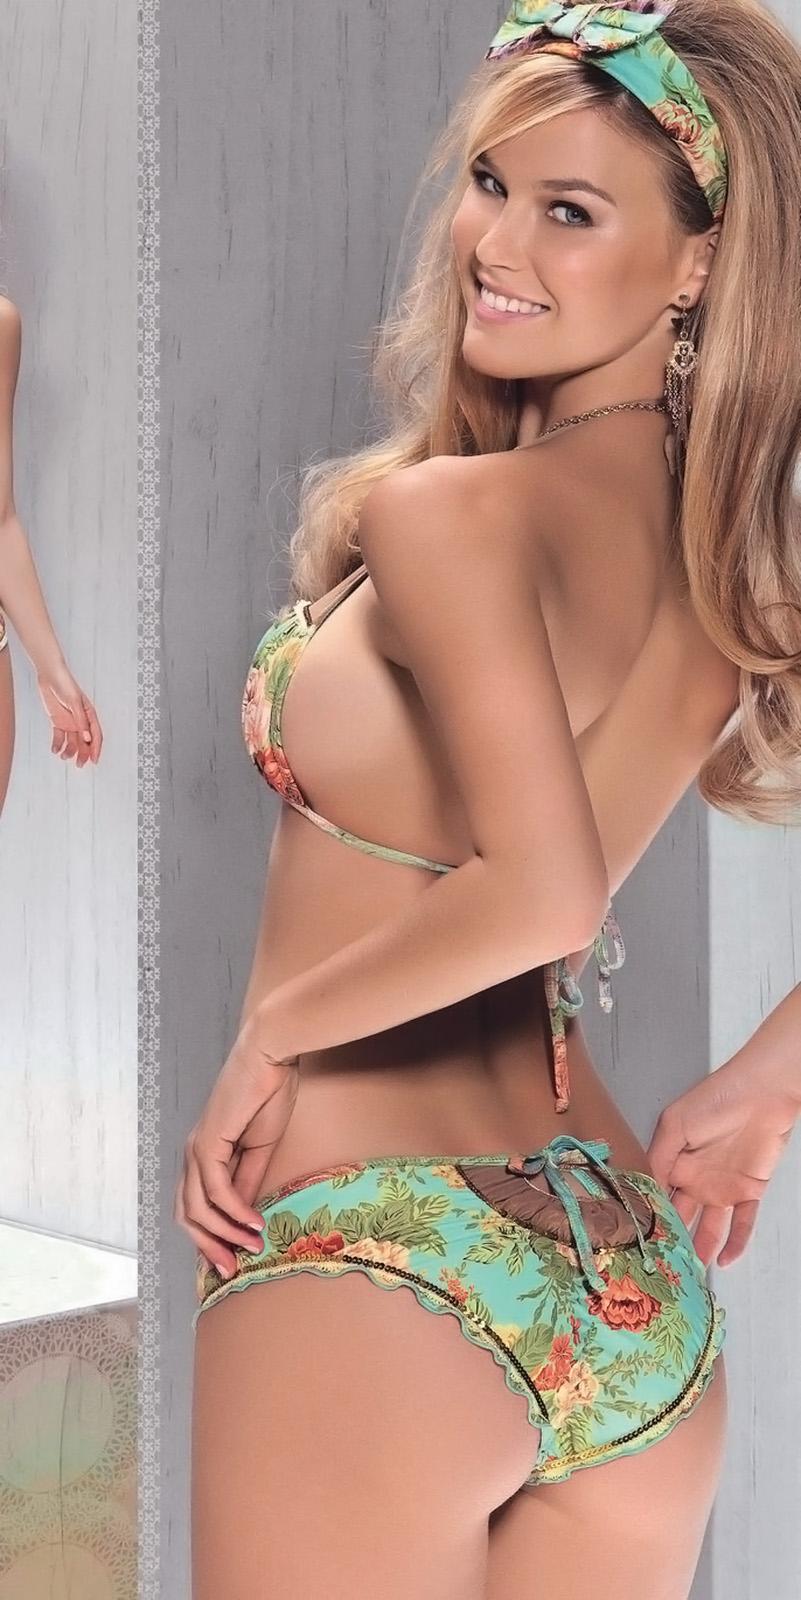 Question congratulate, Bar refaeli bikini ass